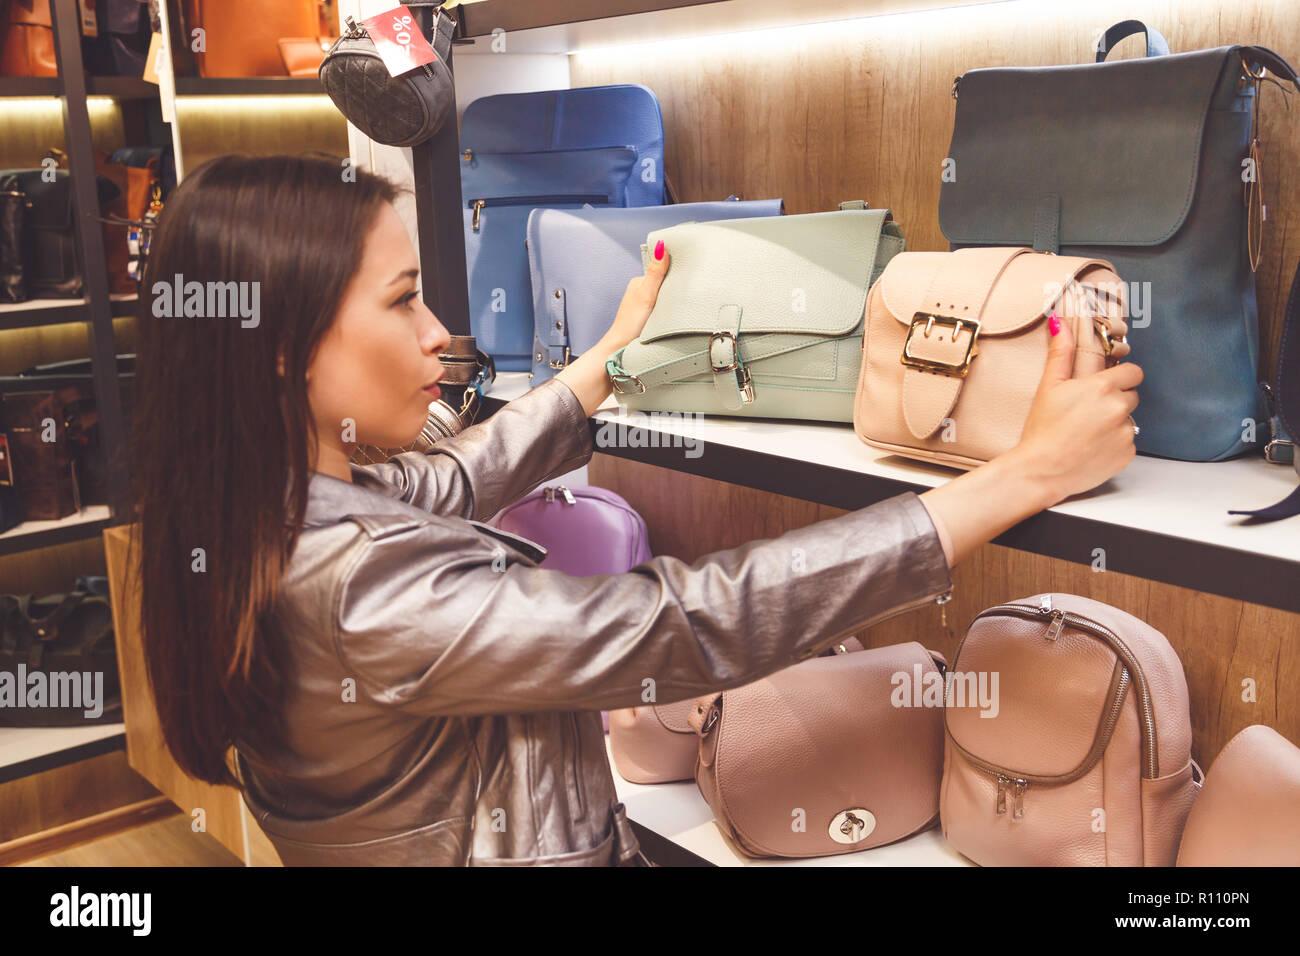 Female customer purchasing new handbag in shop - Stock Image